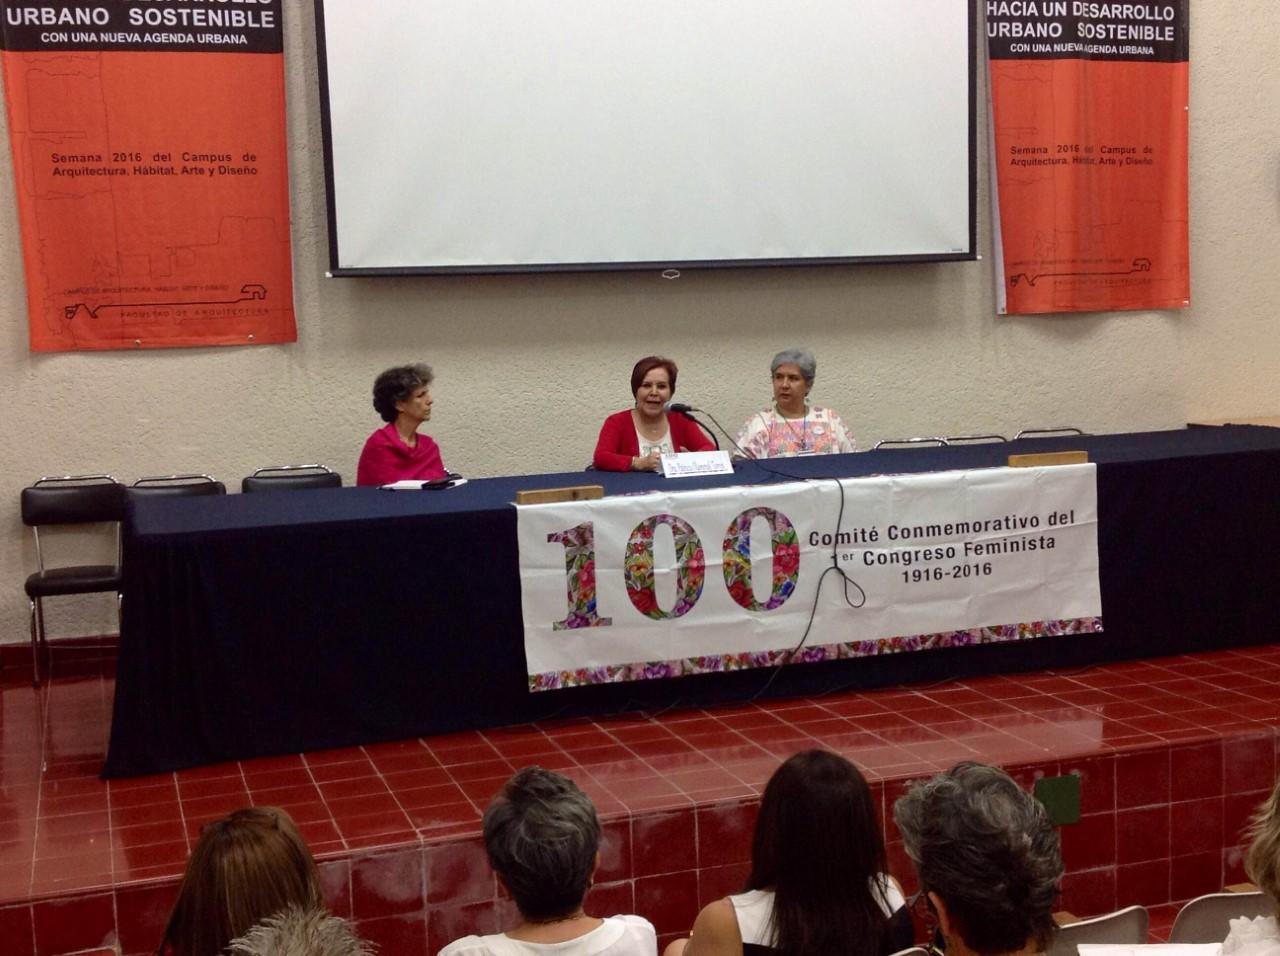 Luces y sombras en participación femenina en México